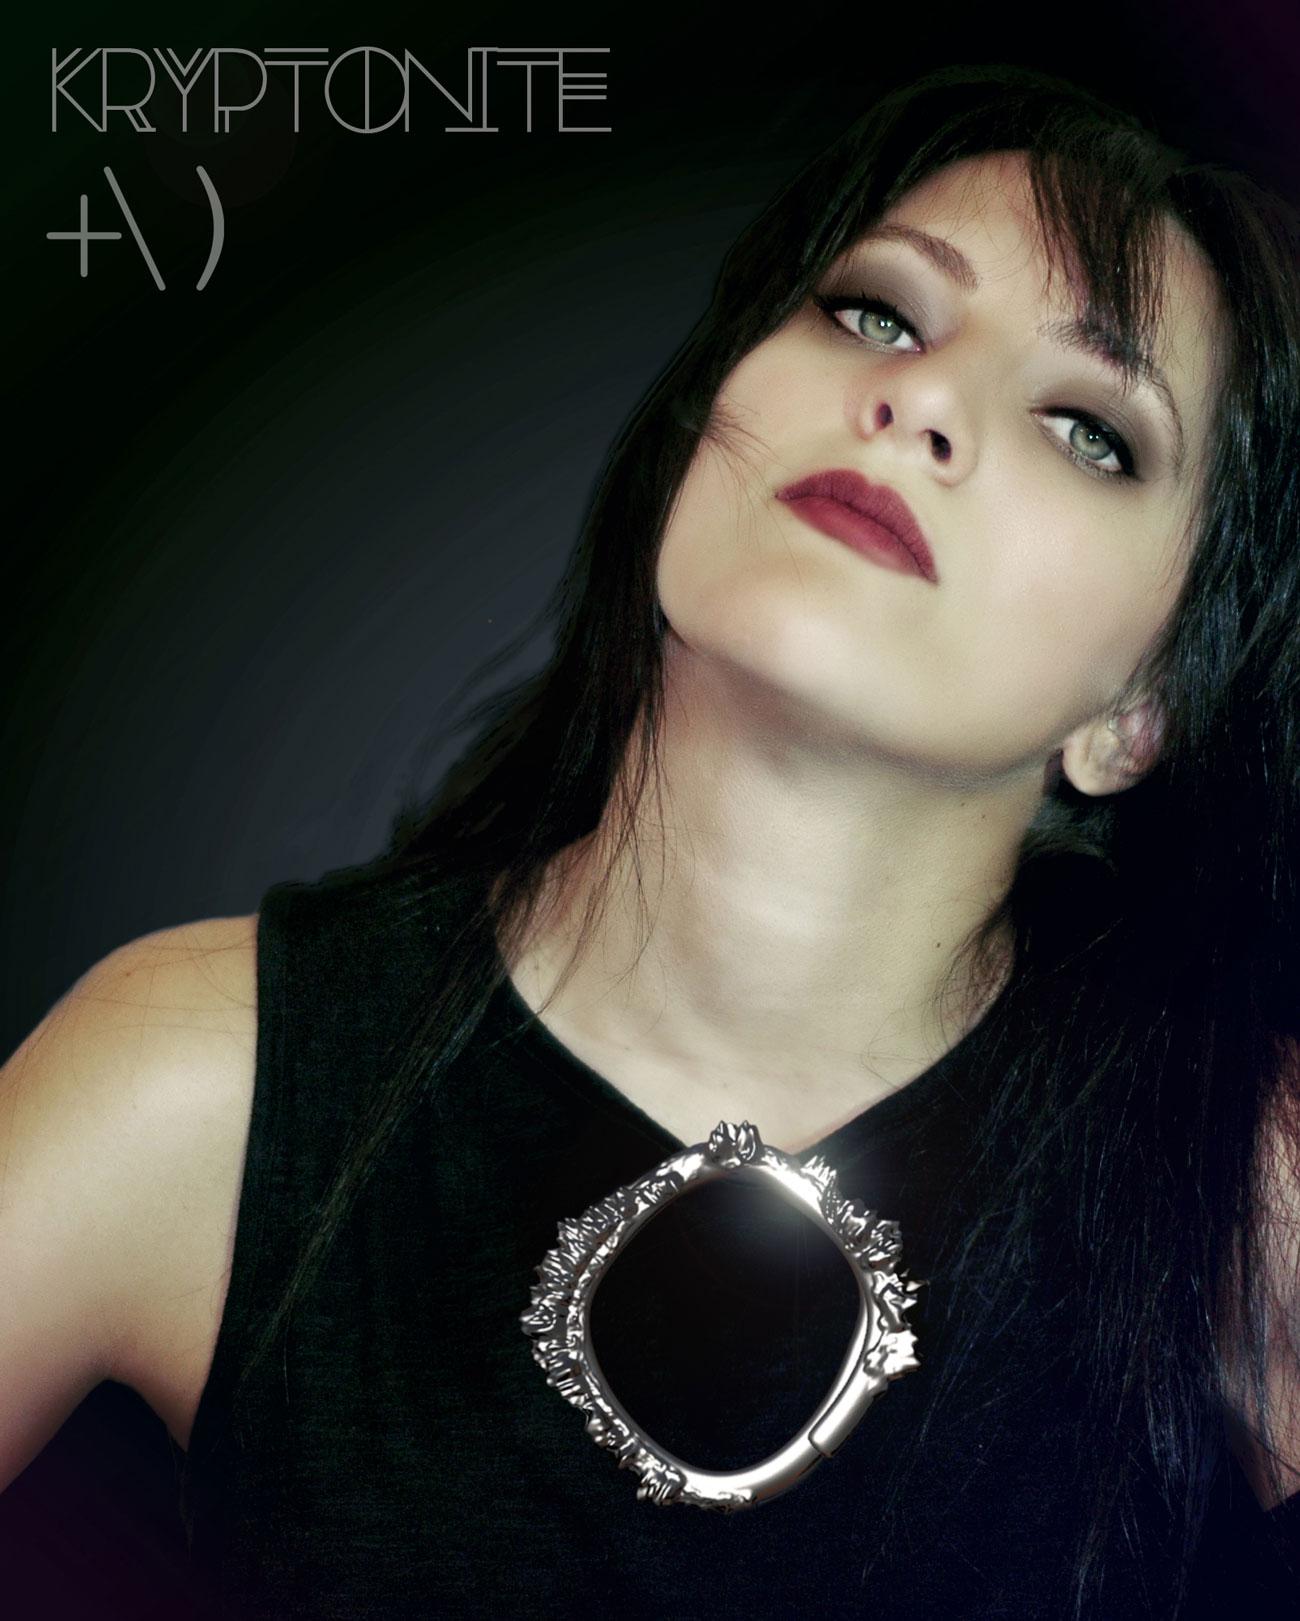 kryptonite brooch necklace